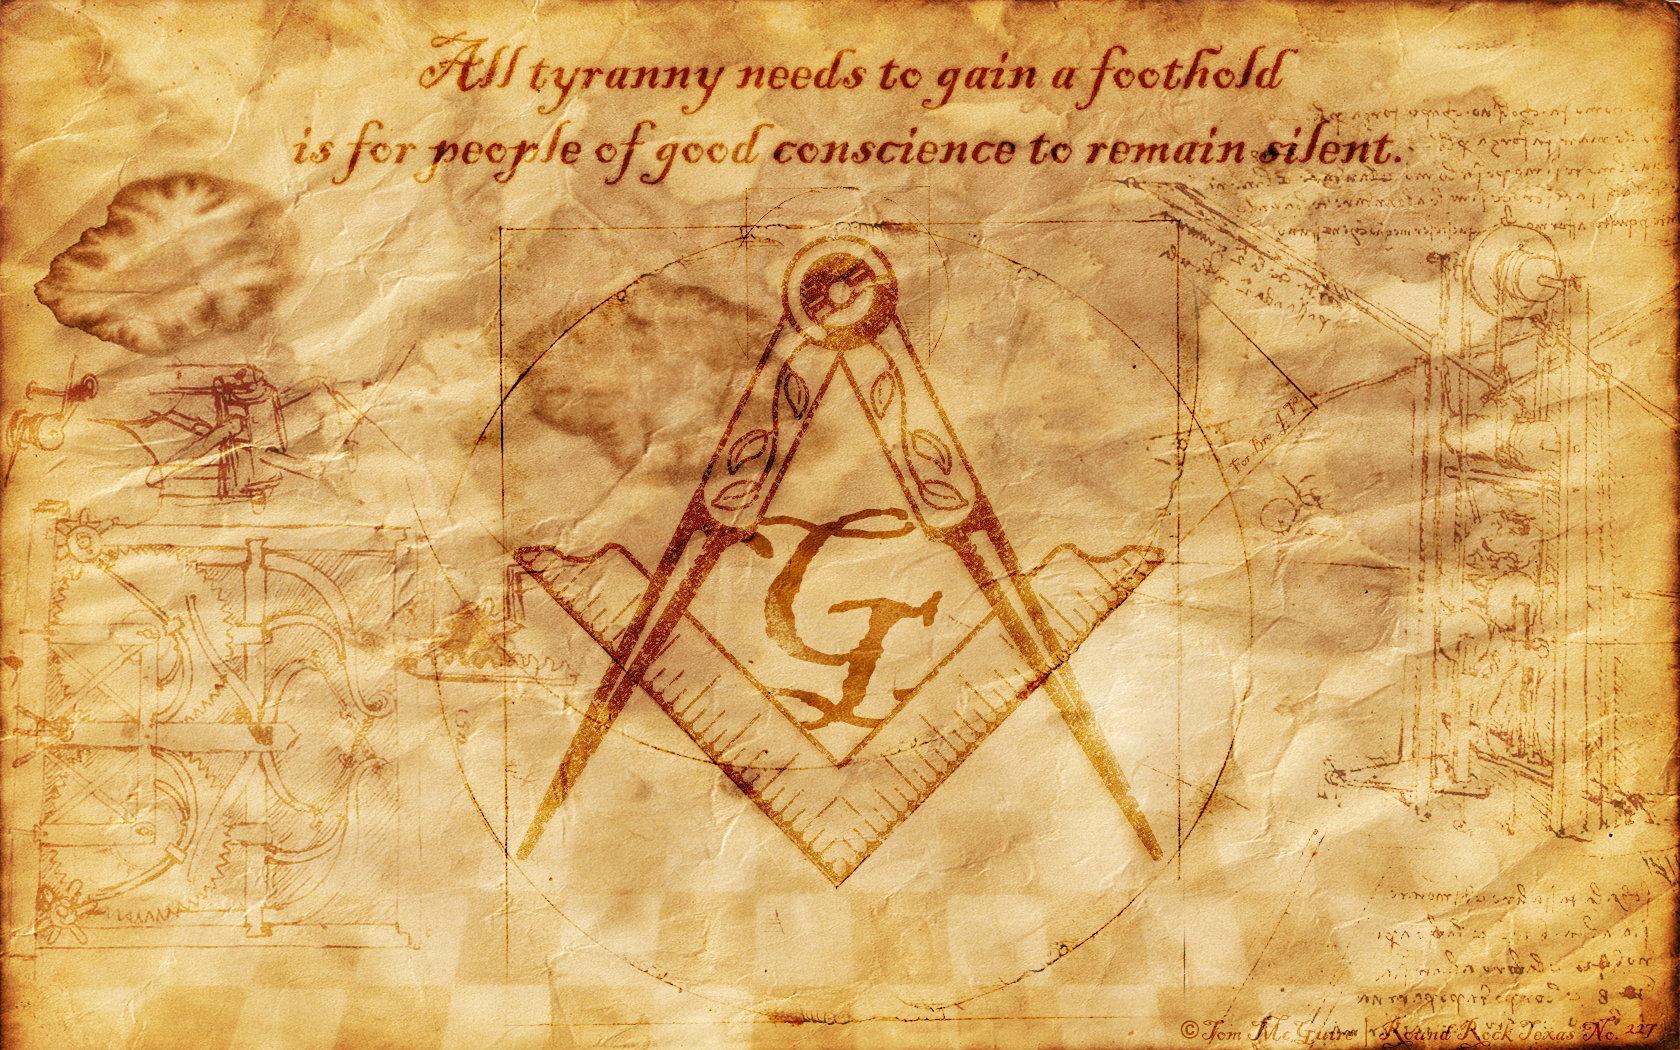 Freemason Wallpaper Backgrounds   wwwproteckmachinerycom 1680x1050